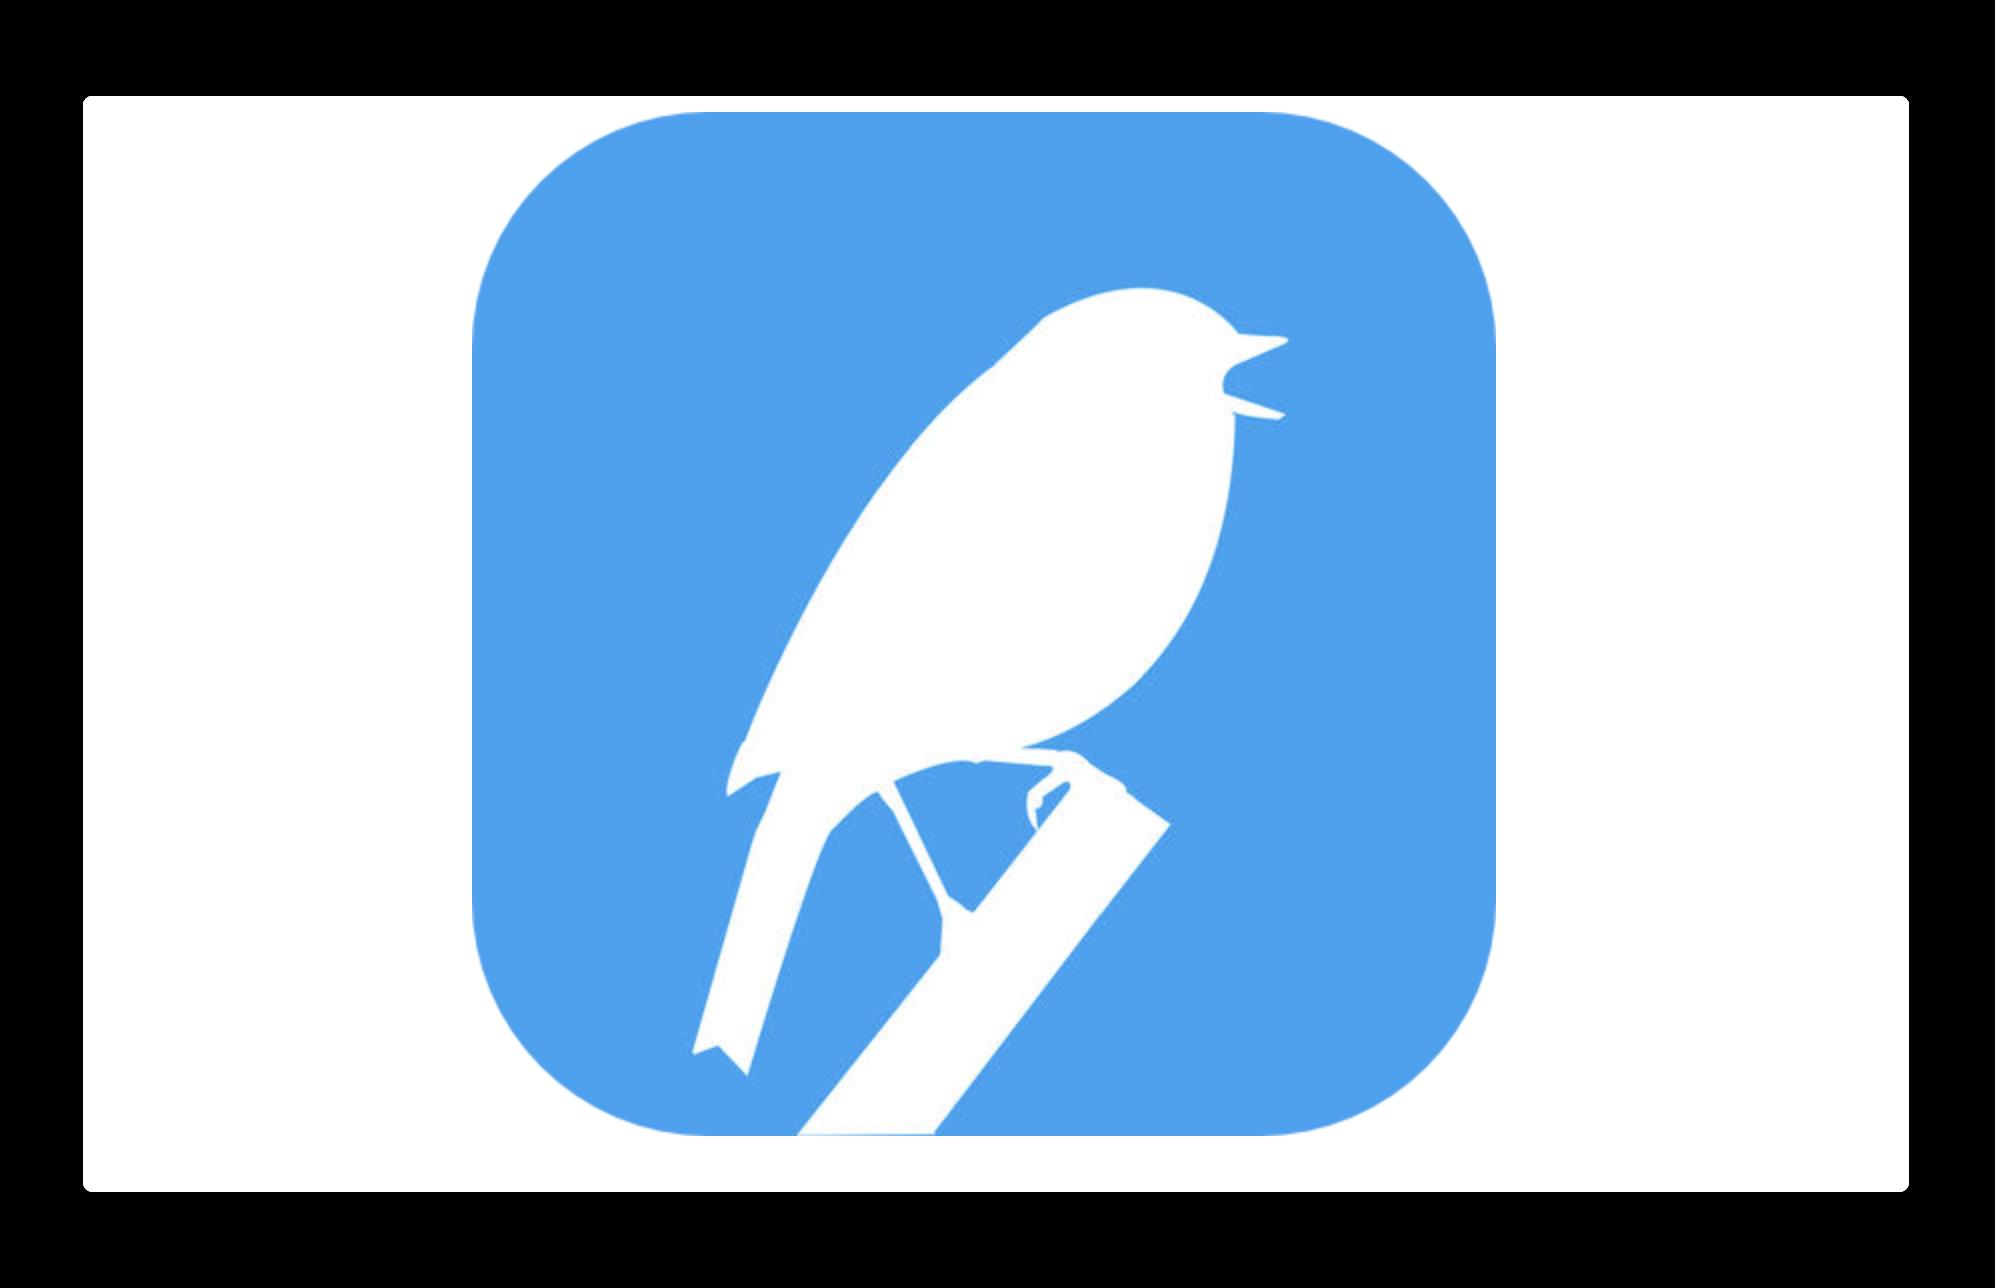 Apple Watchで完全にTwitterをサポートするアプリ「Chirp for Twitter」